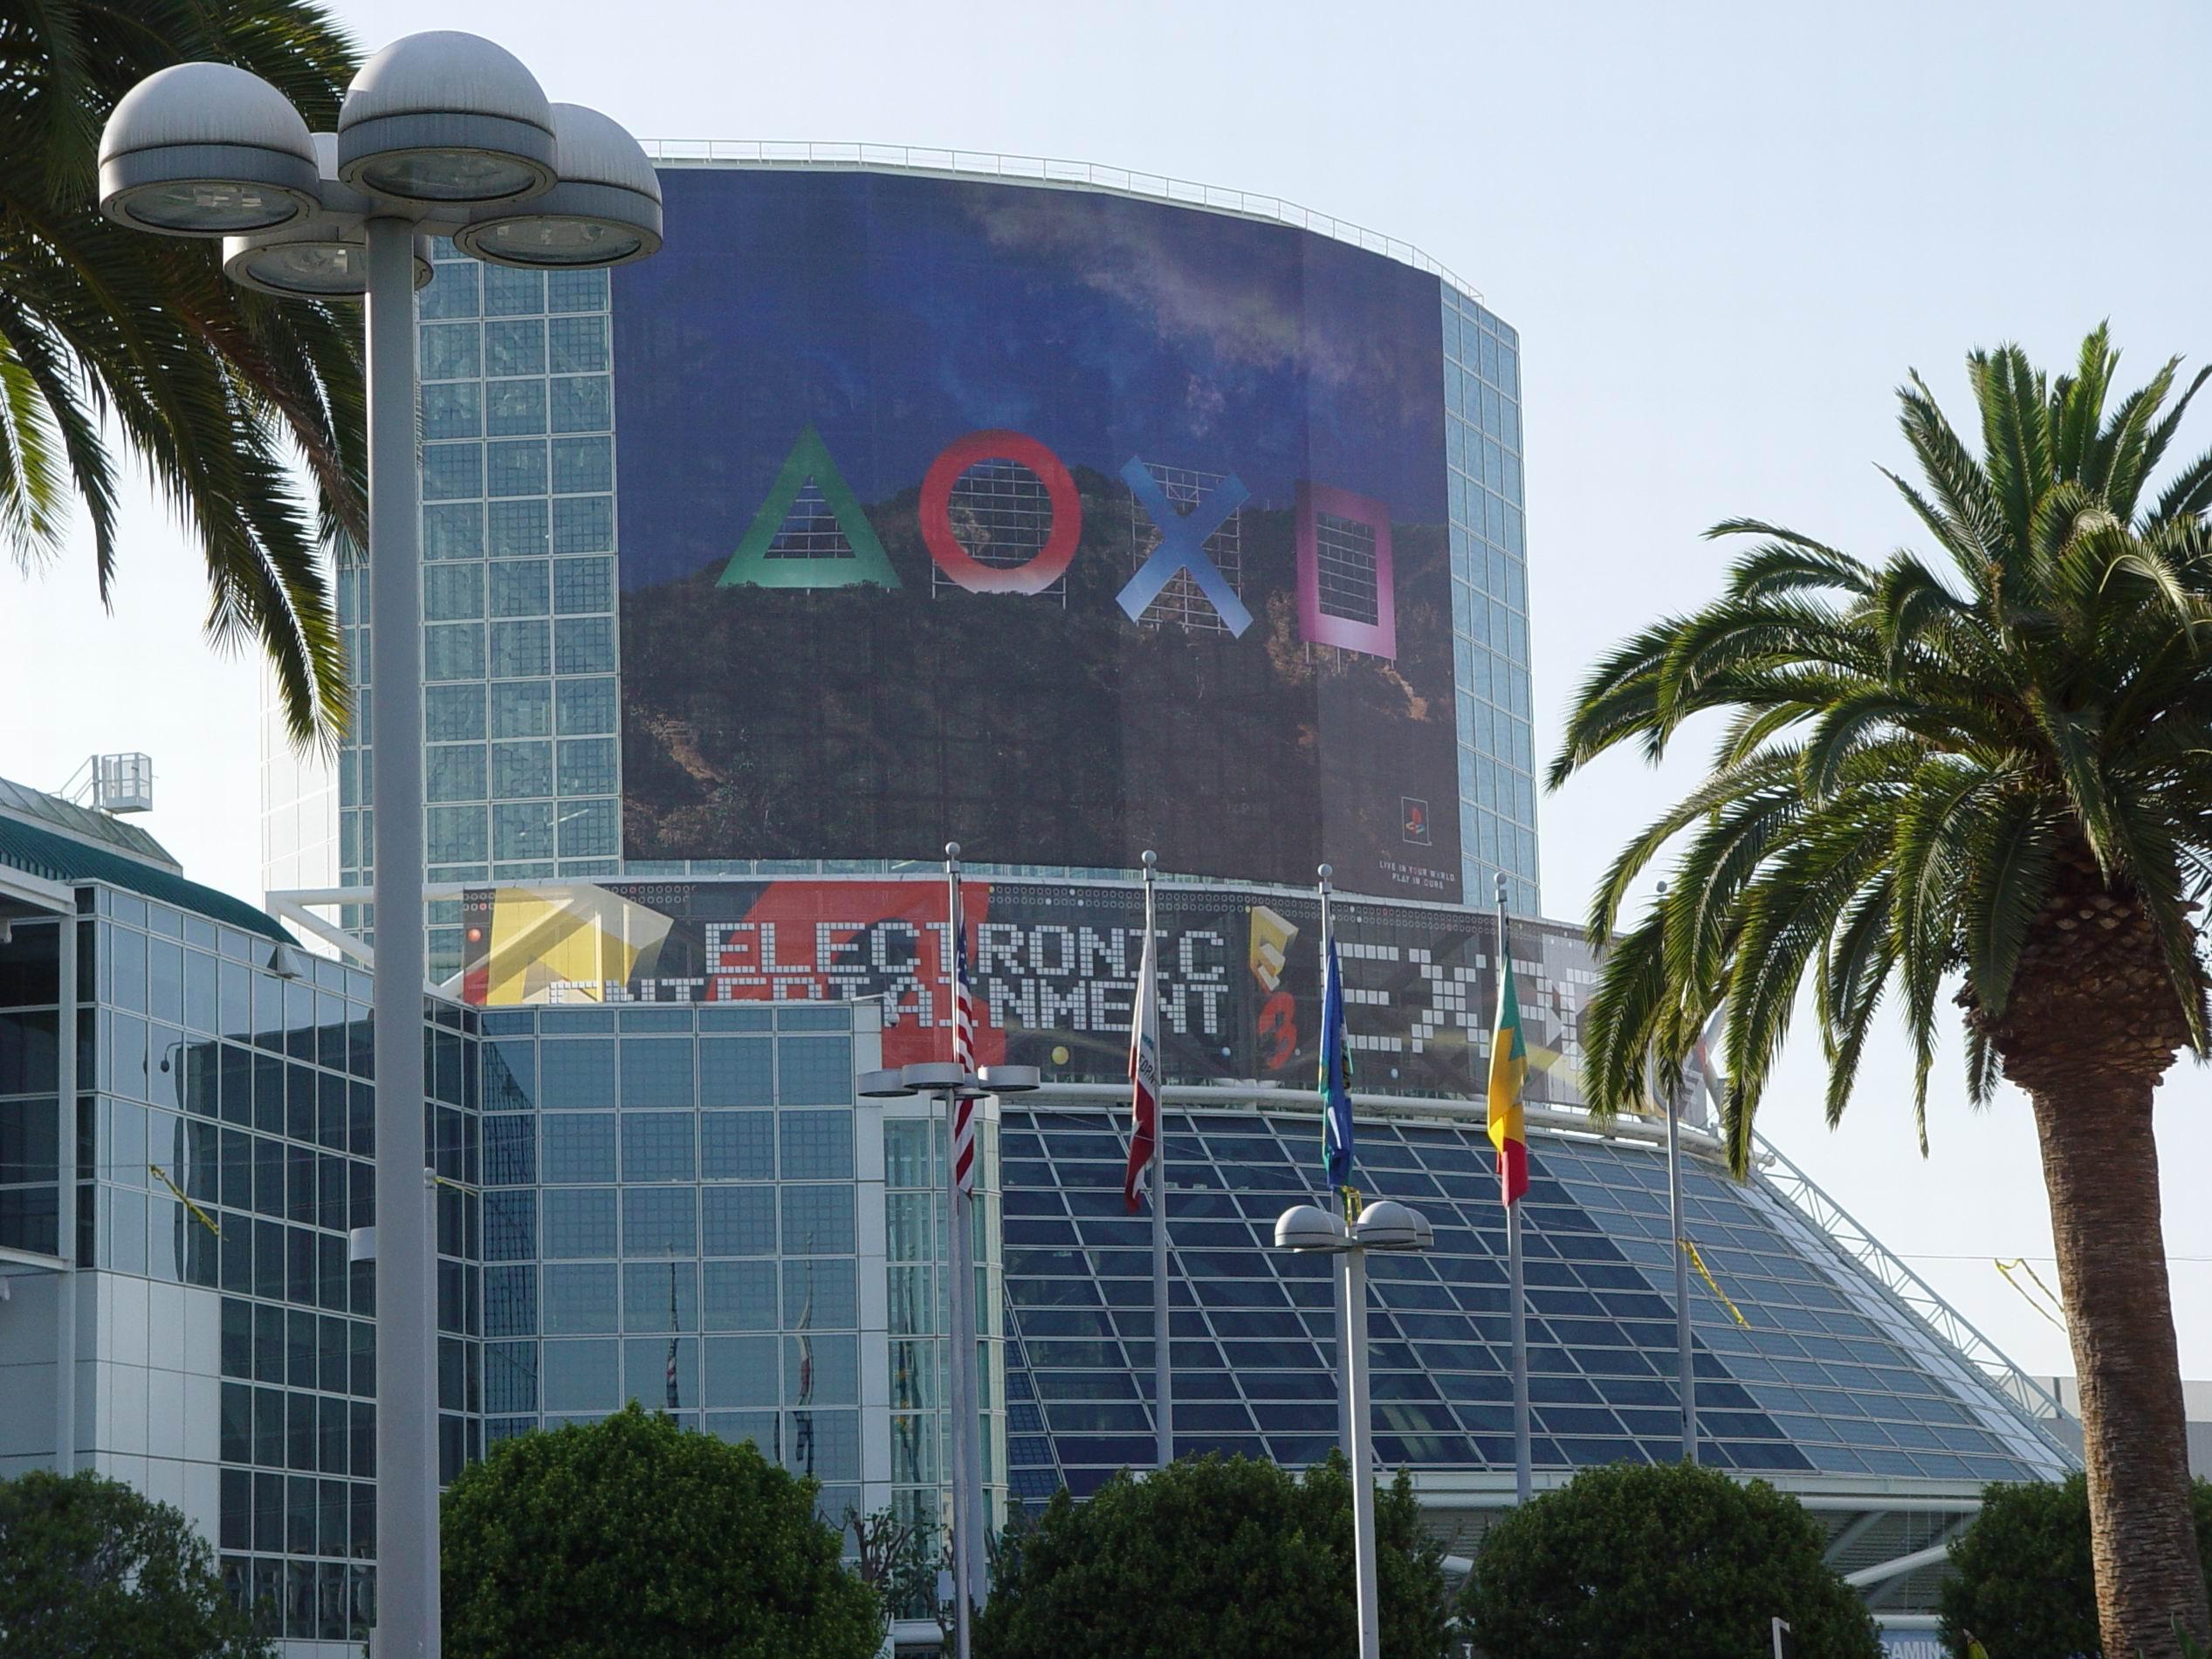 E3 2004 : Le journal d'Aliasaka